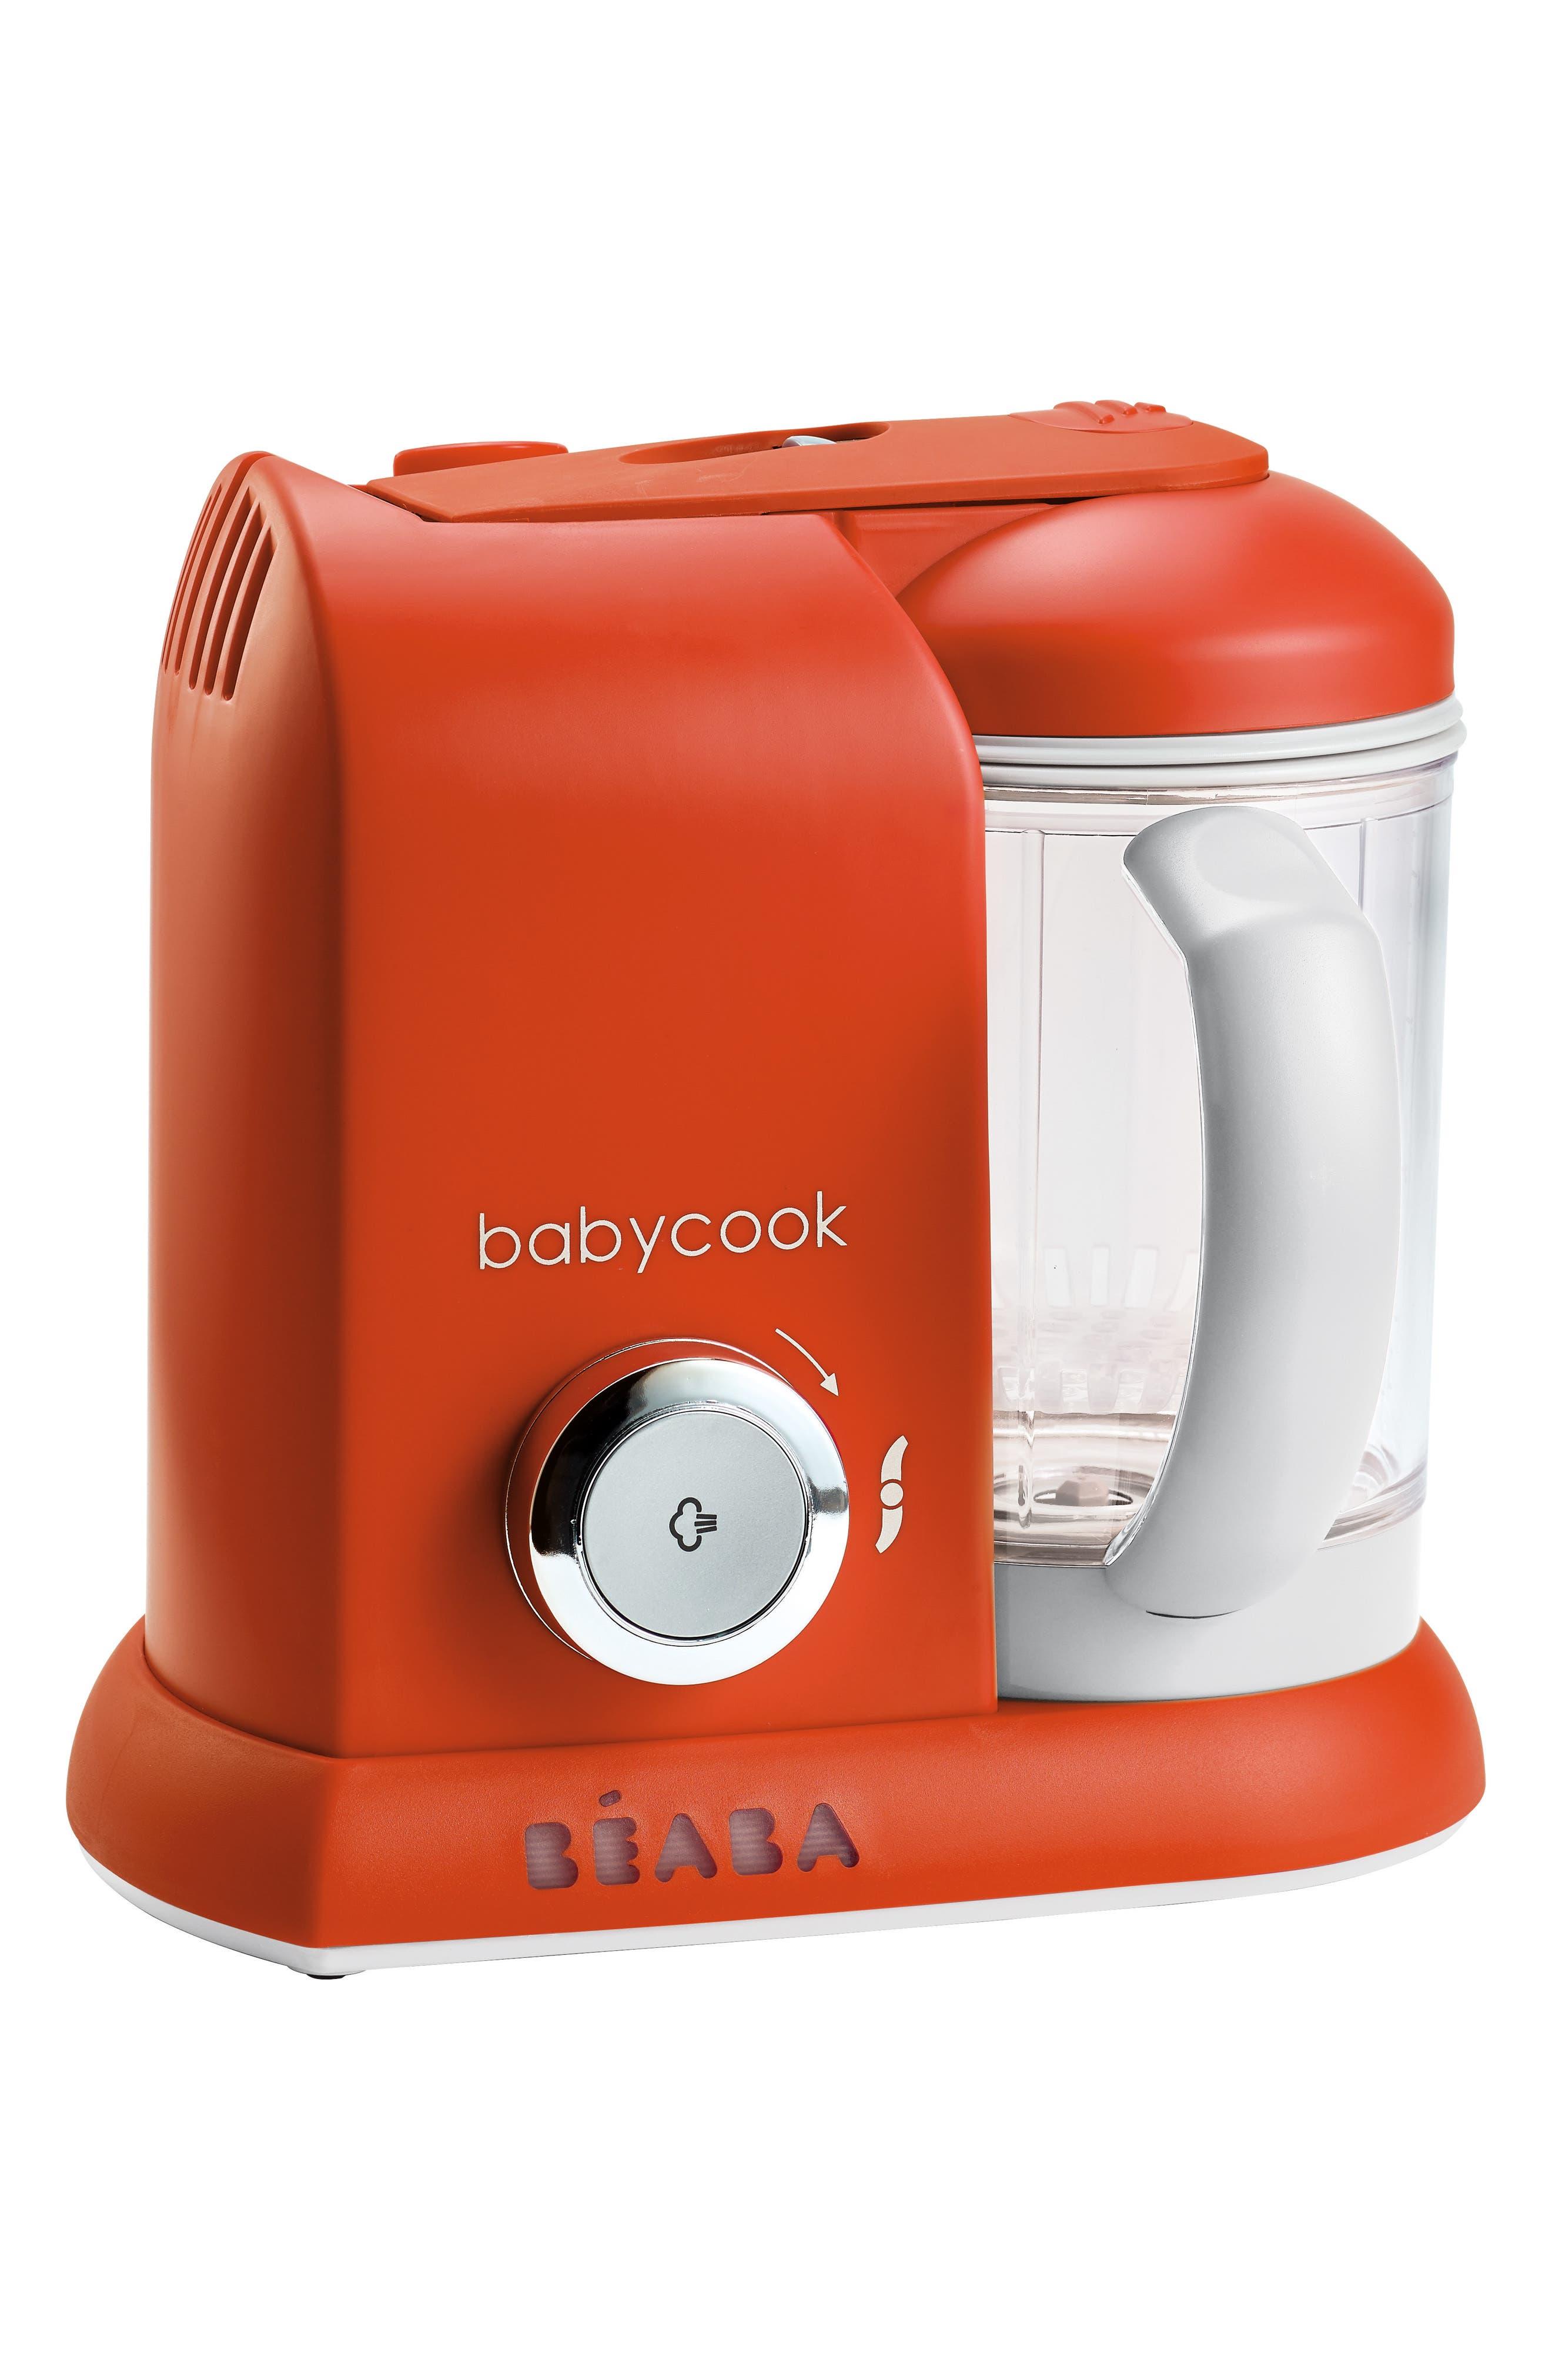 Main Image - BÉABA Babycook Baby Food Maker